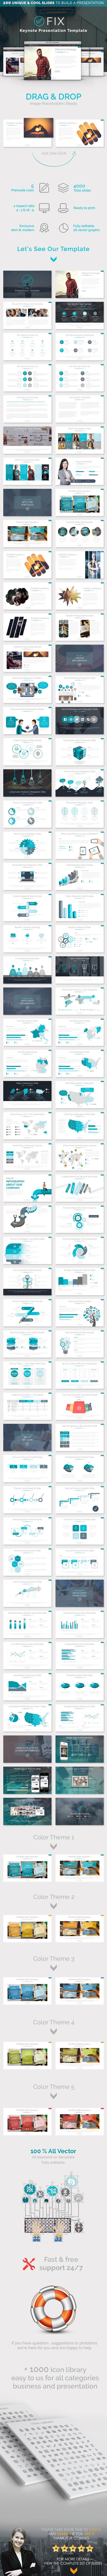 FIX - Keynote Multipurpose Presentation Template - Business Keynote Templates